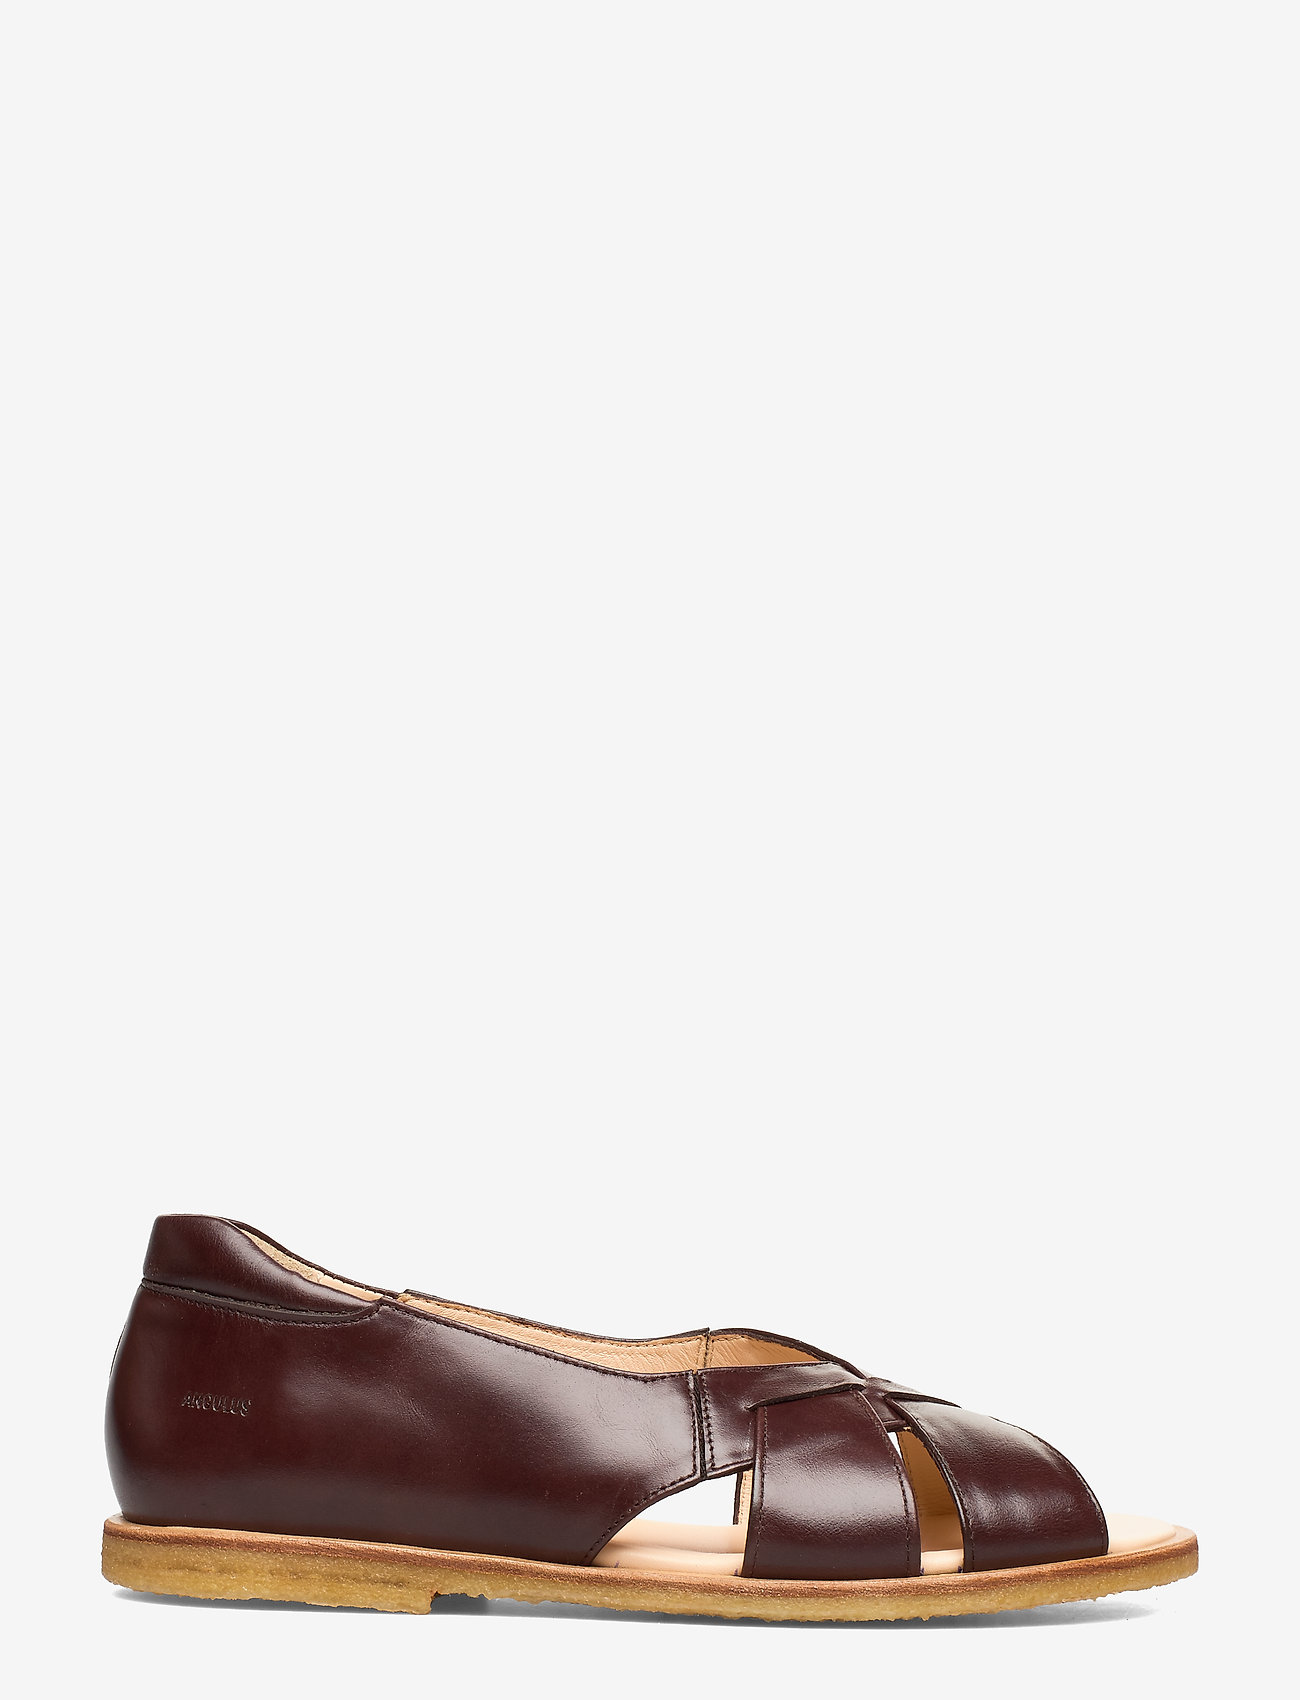 ANGULUS - Sandals - flat - open toe - op - flade sandaler - 1836/002 dark brown/dark brown - 1